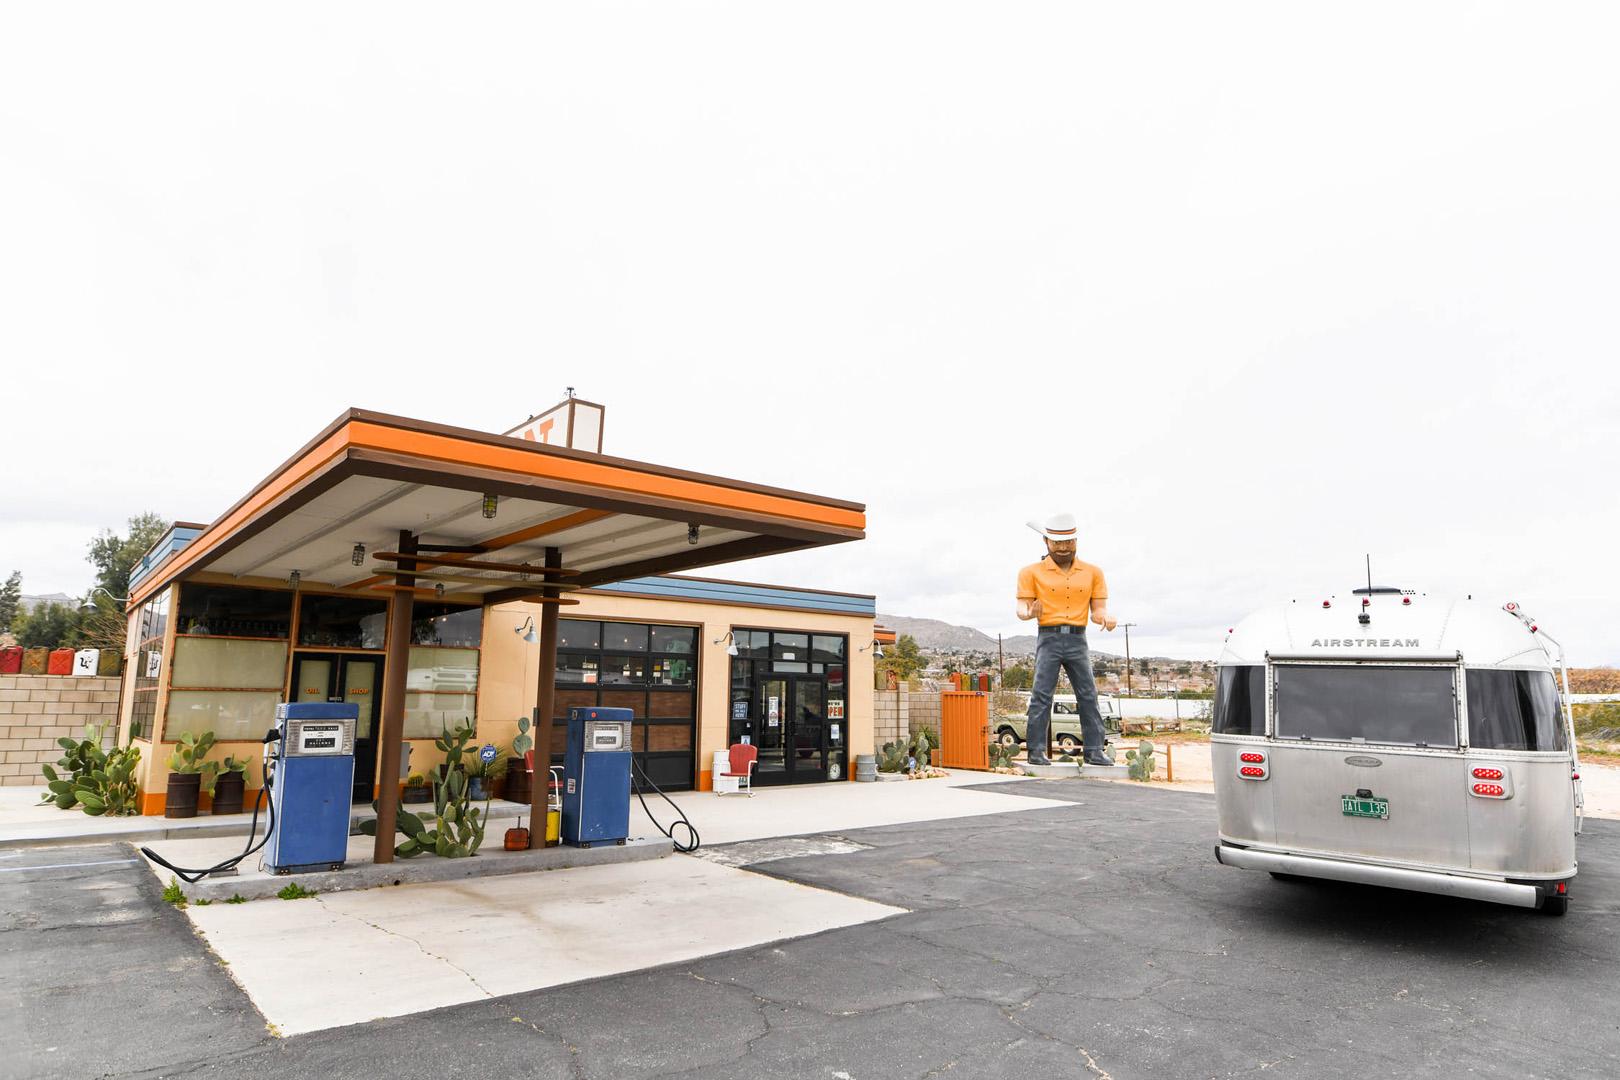 Airstream Travel Trailer RV Camper Trailer at Gas Station